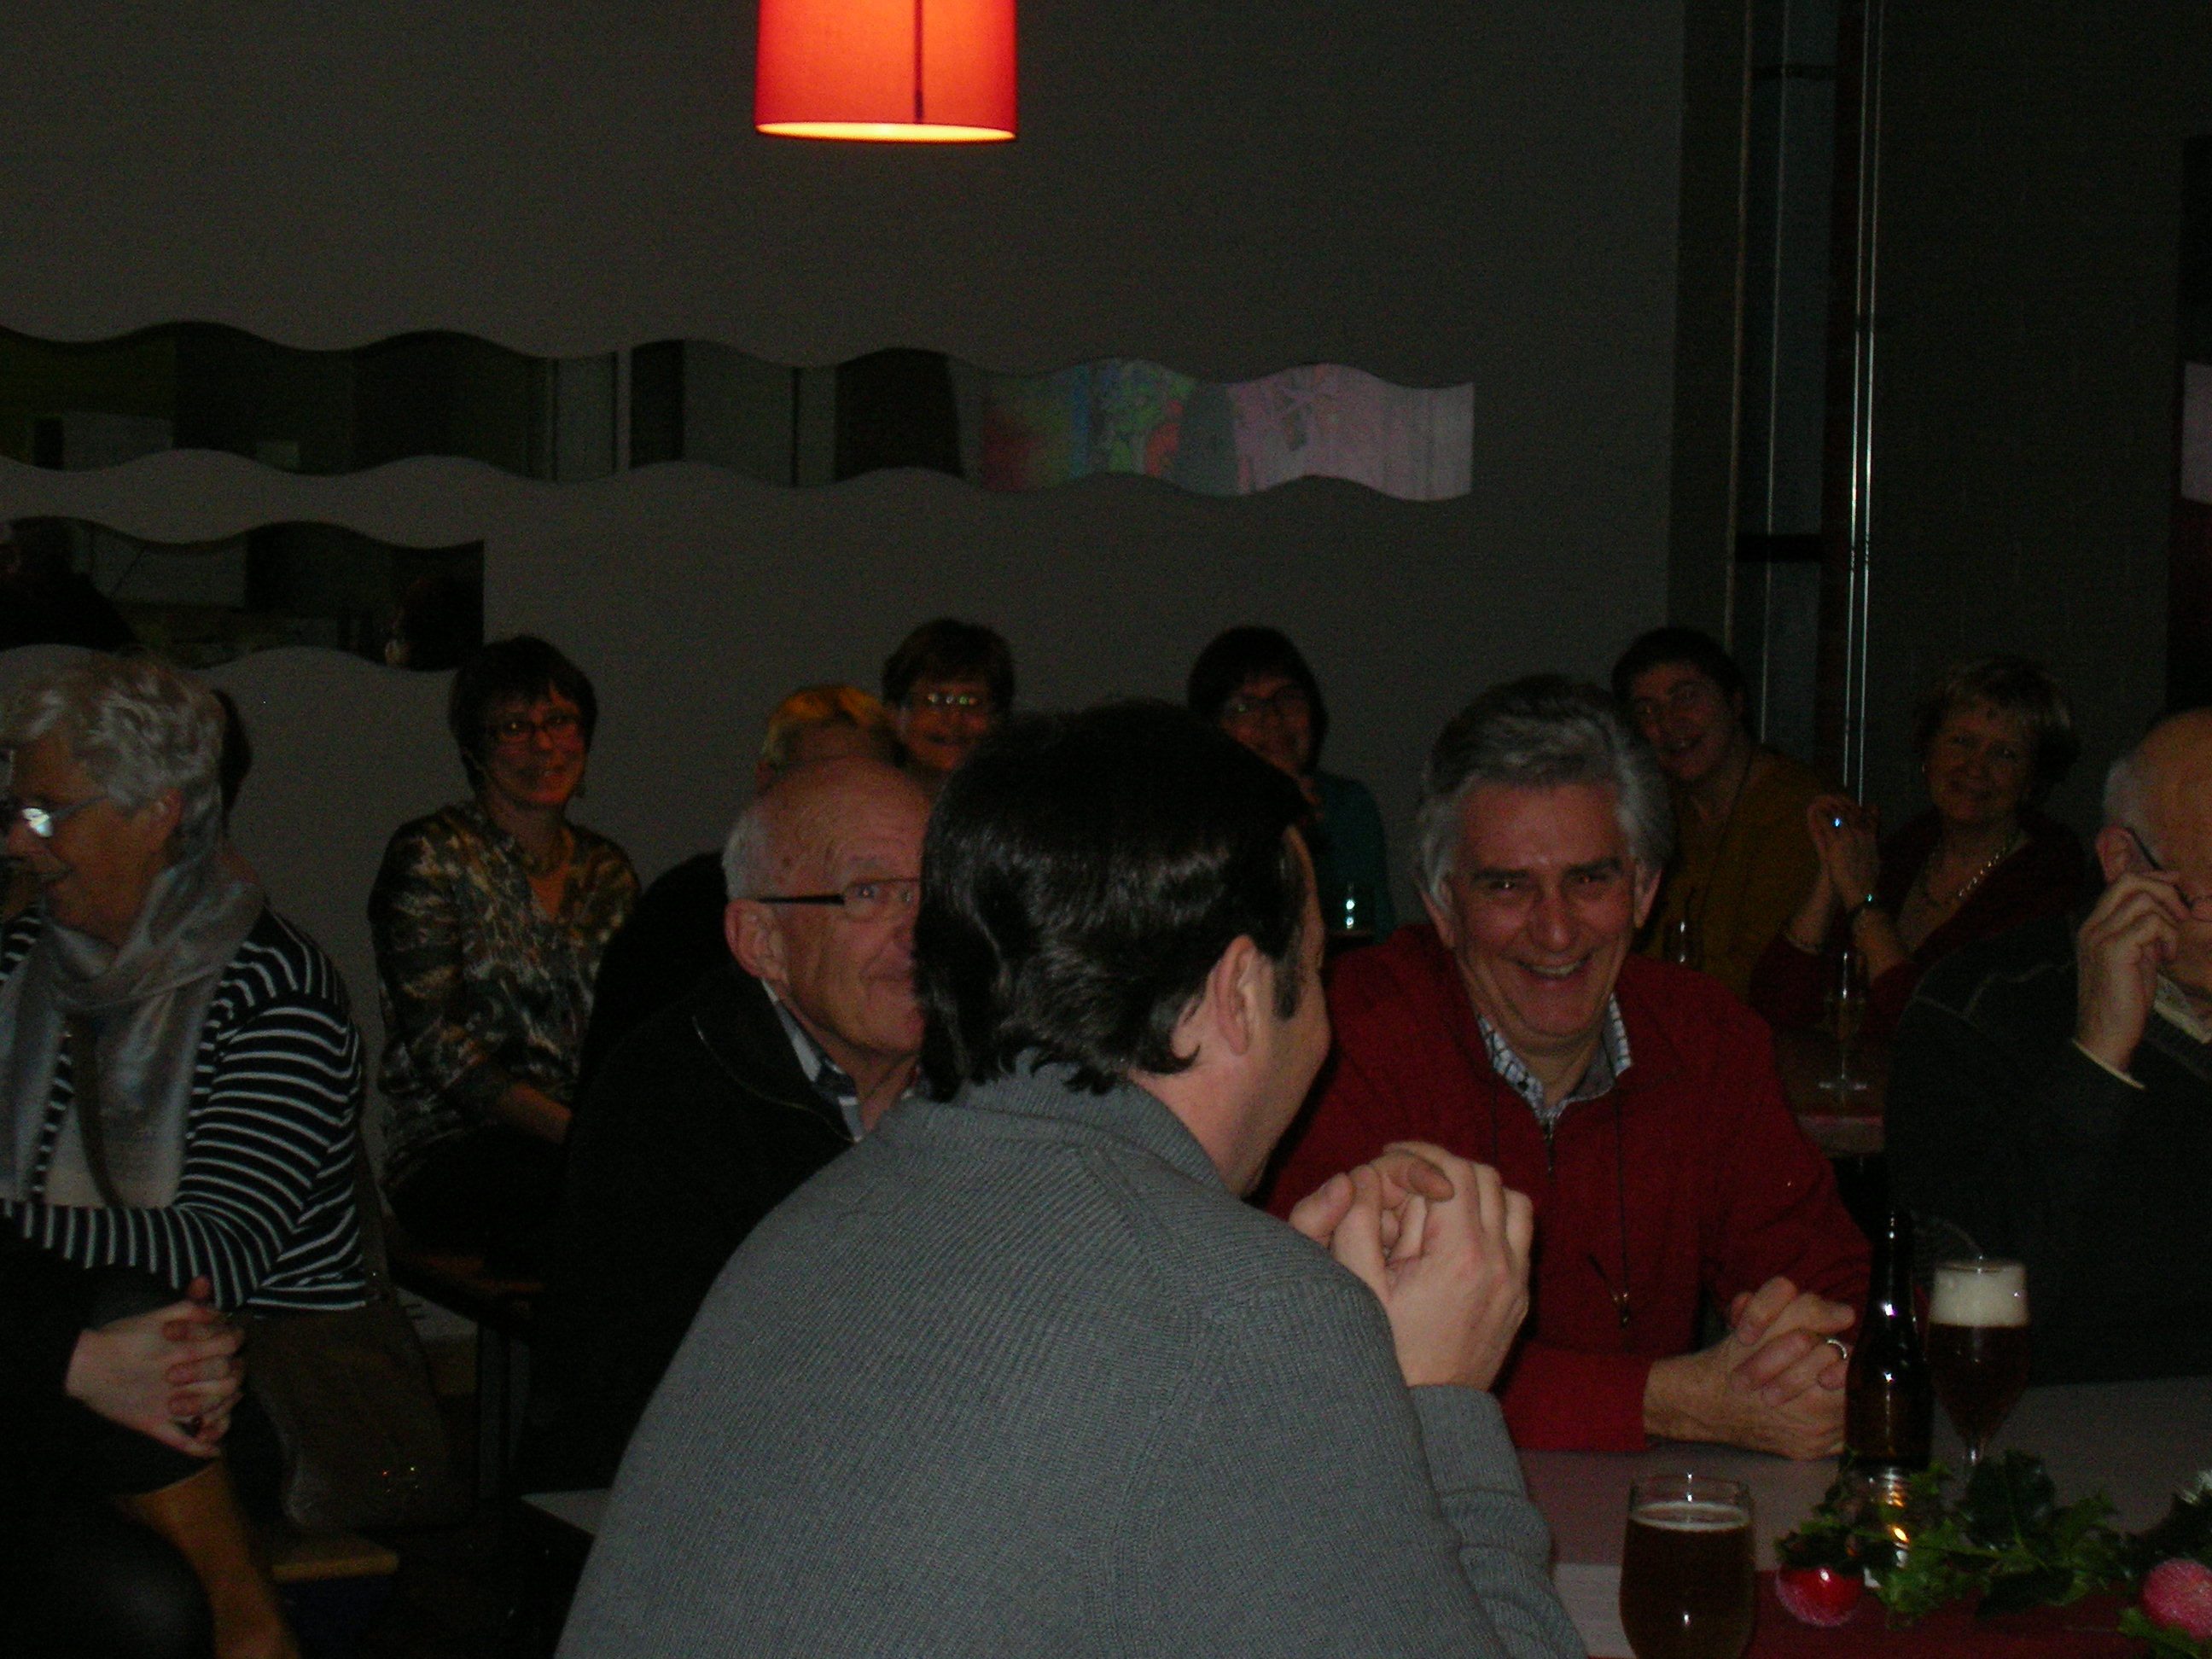 Nieuwjaarsreceptie 2014/01/08 Cantando Wijn